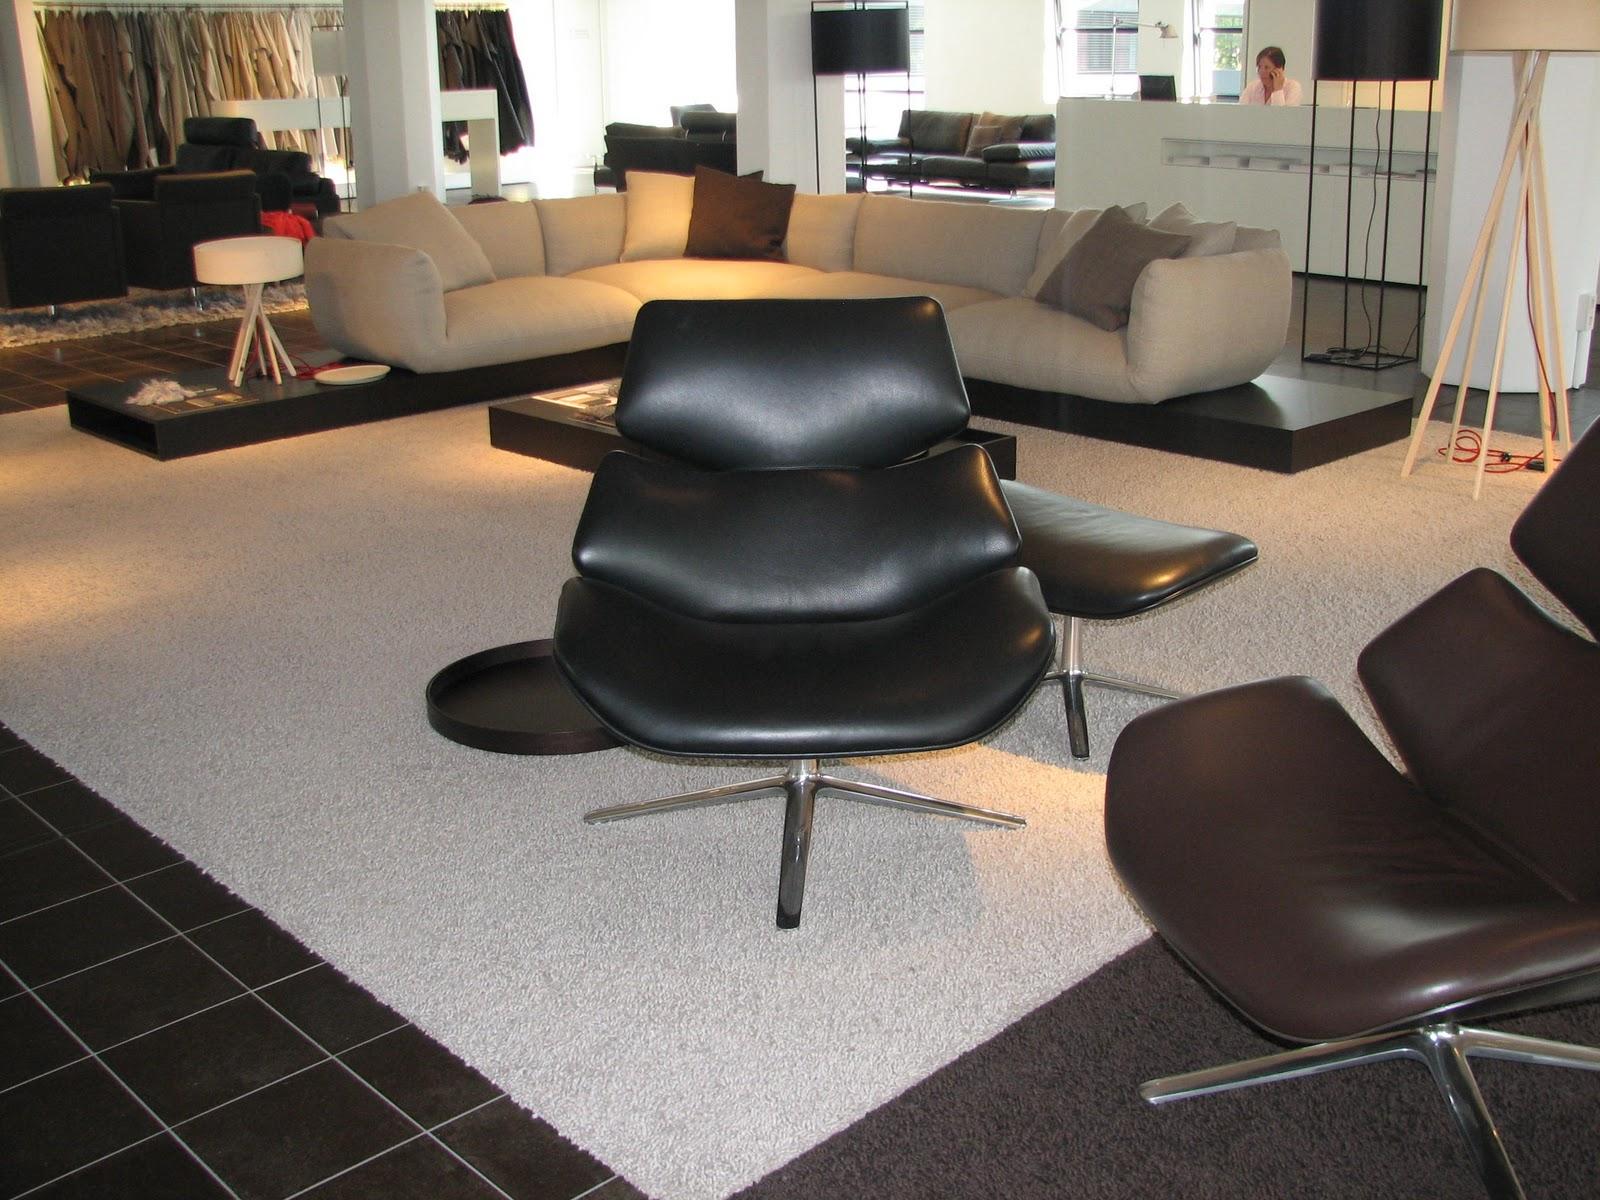 ploemen interieur showroom cor en interl bke in rheda. Black Bedroom Furniture Sets. Home Design Ideas